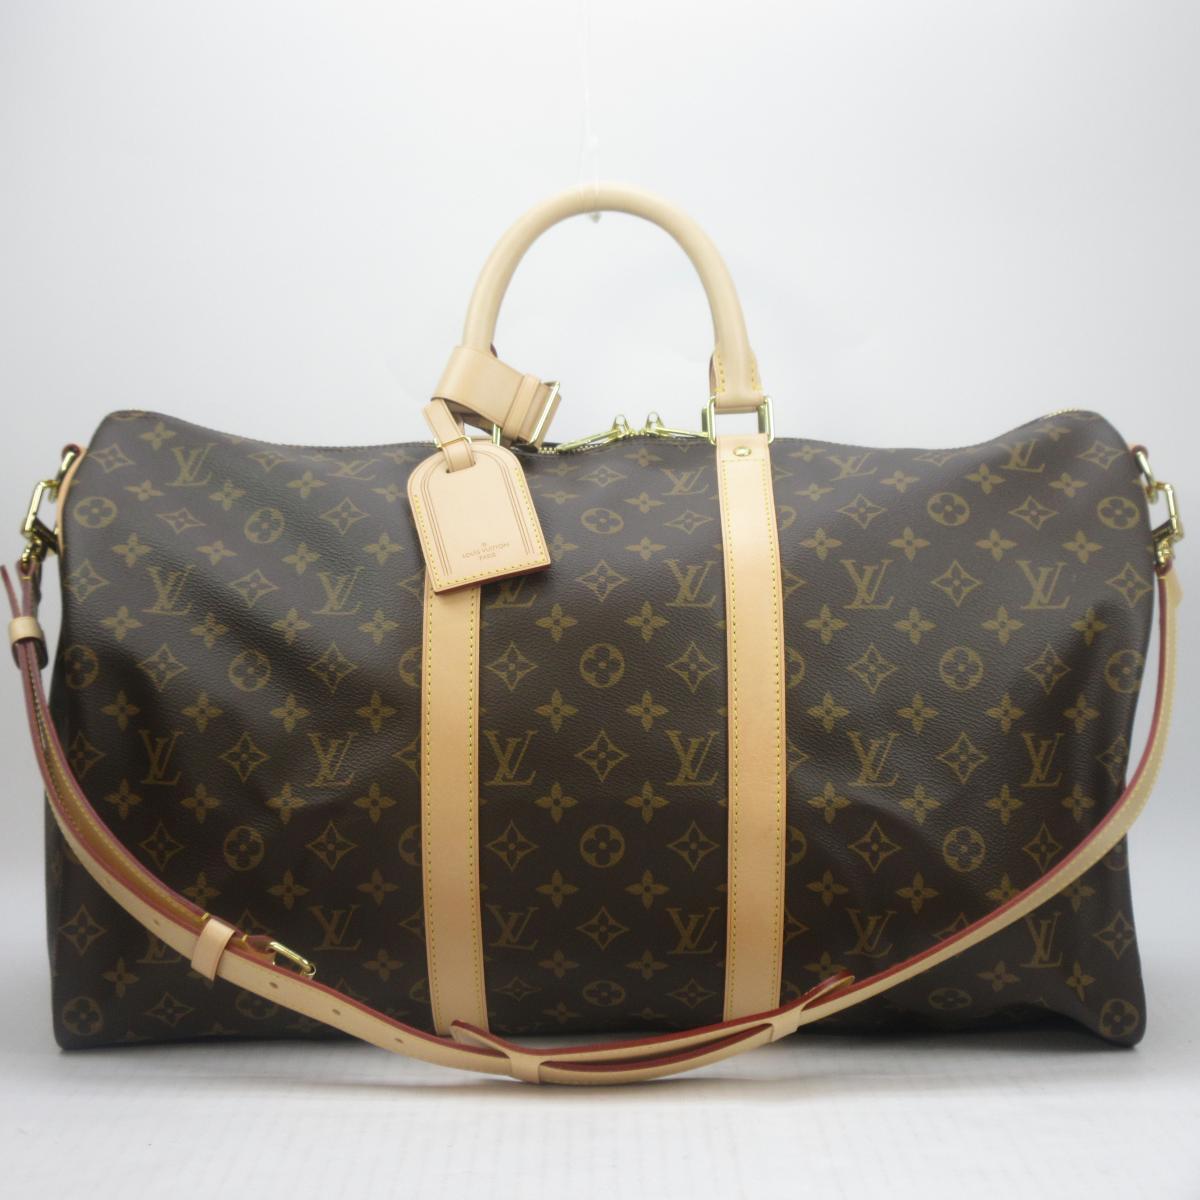 23fed05e5a8f Authentic LOUIS VUITTON Keepall Bandouliere 50 Shoulder Boston Travel Bag  M41416 Monogram